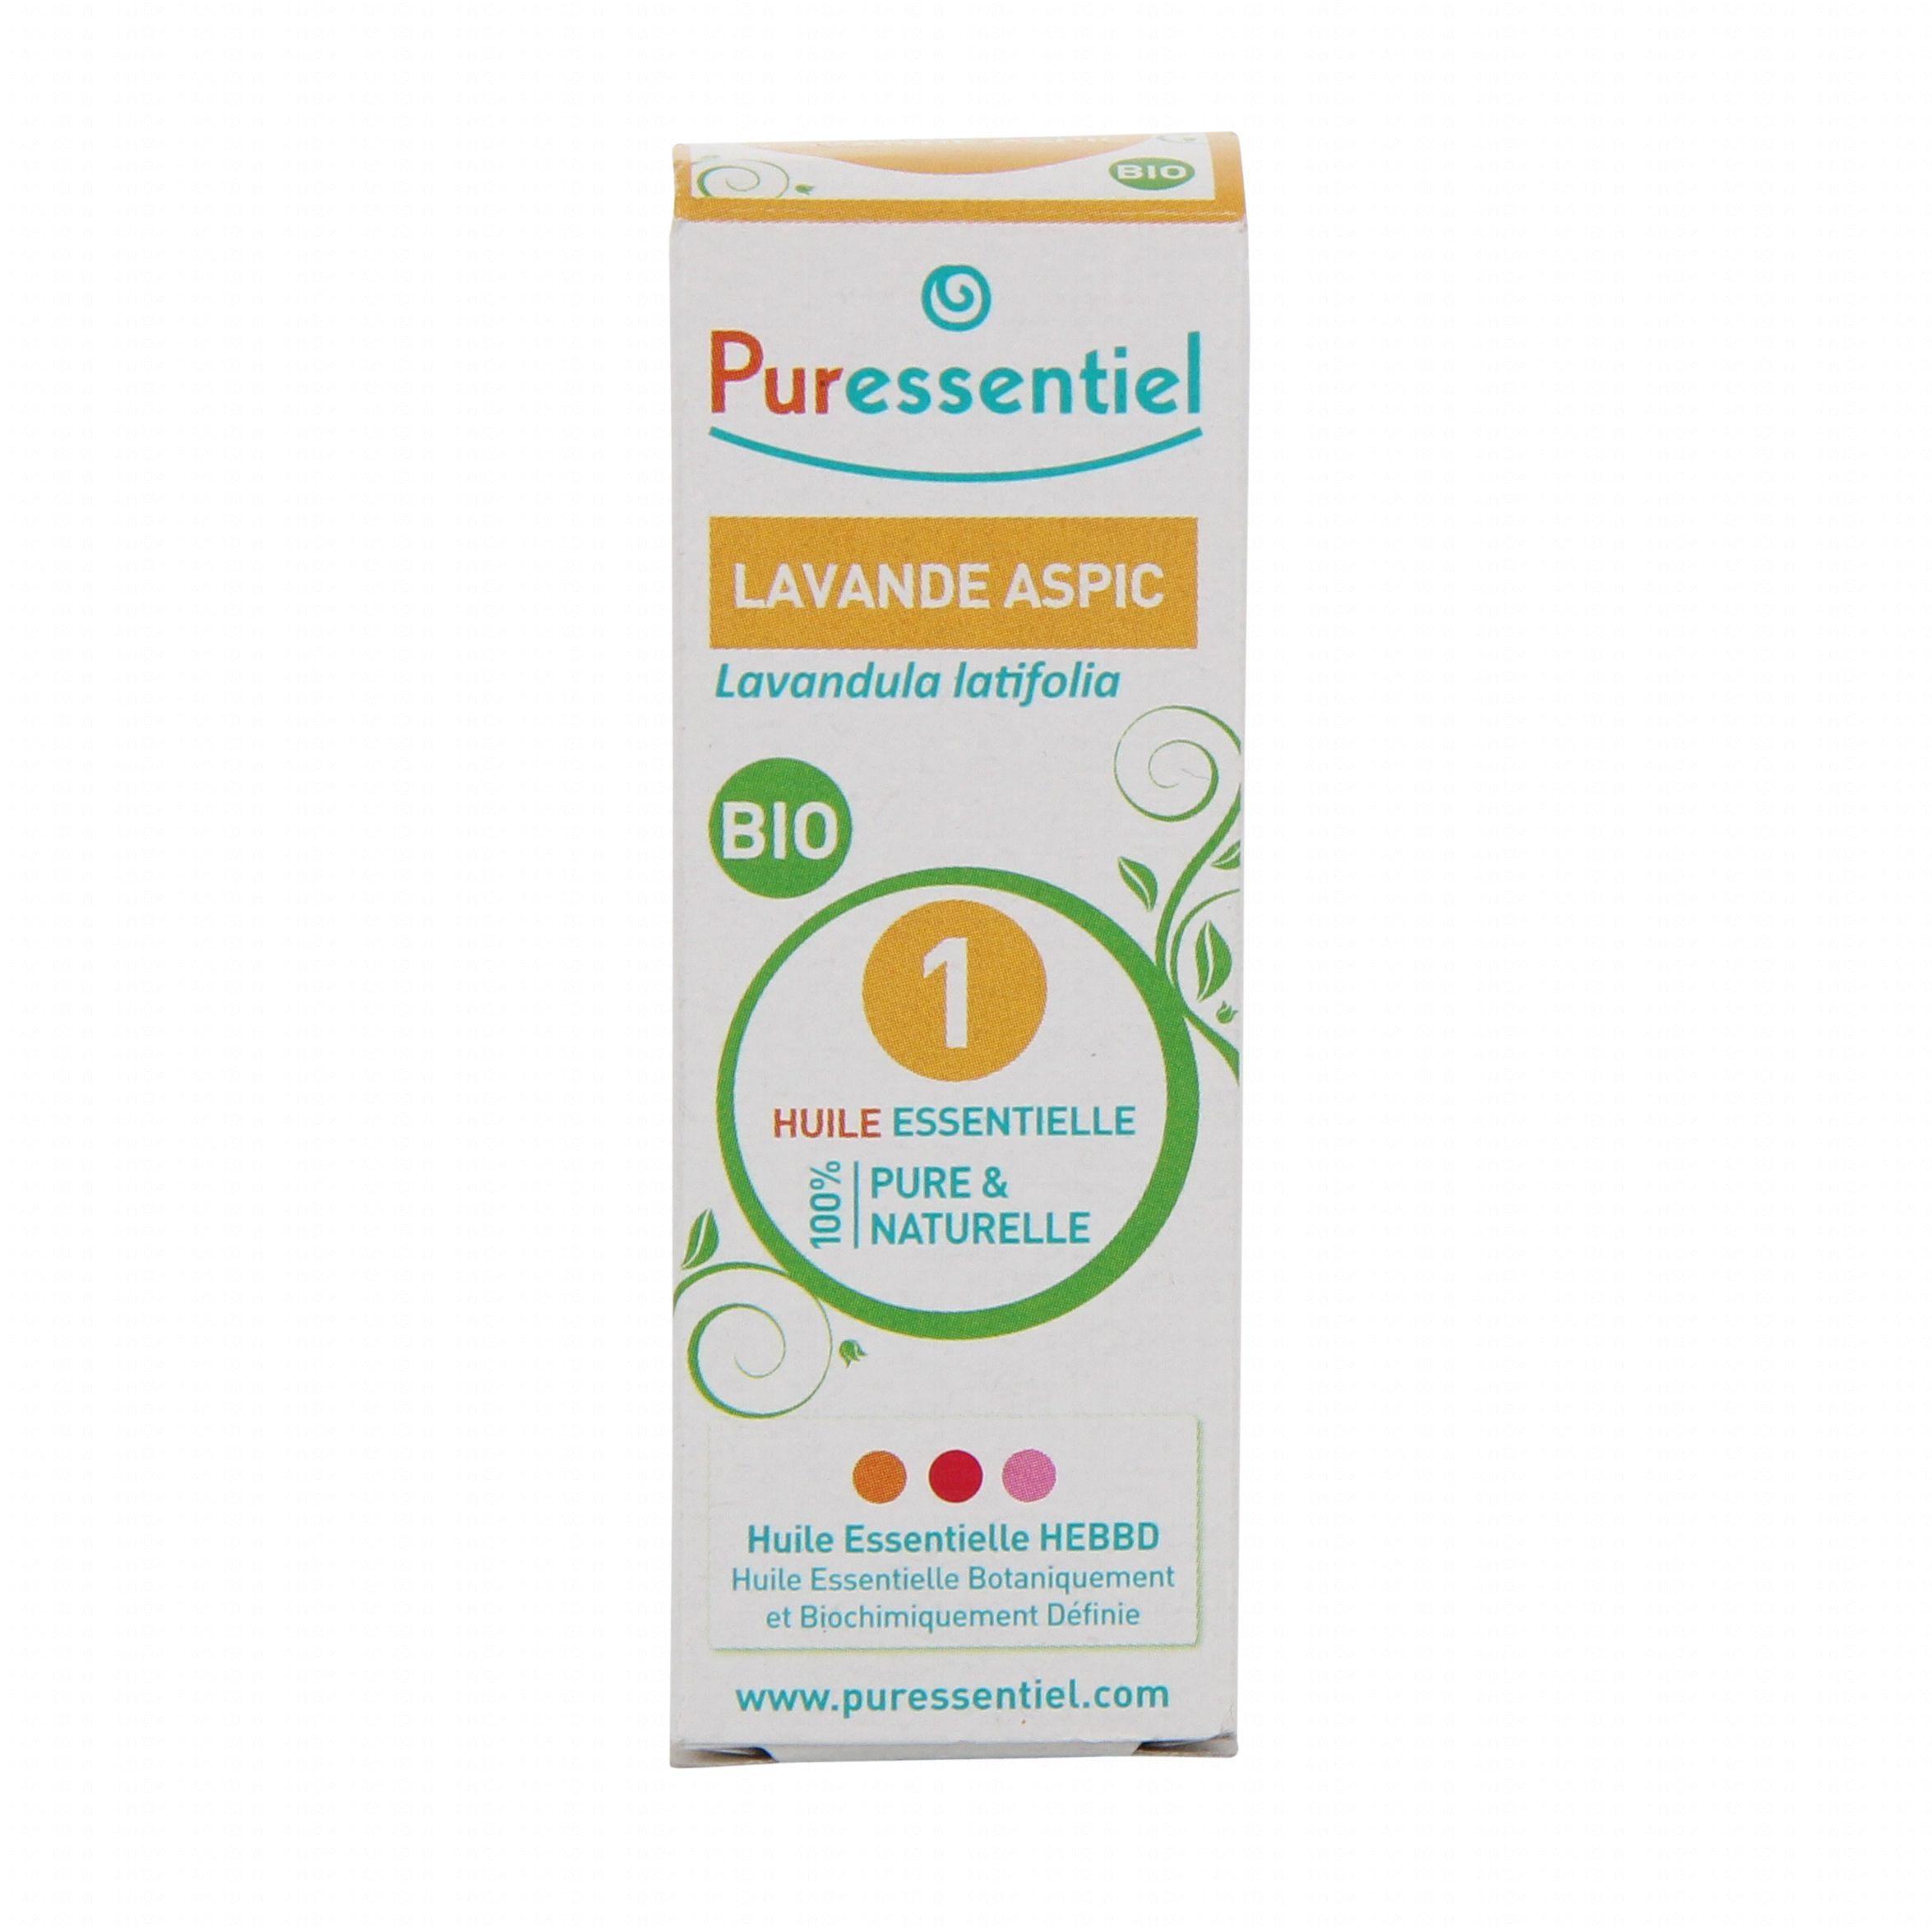 Puressentiel huile essentielle bio lavande aspic flacon - Huile essentielle de lavande prix ...